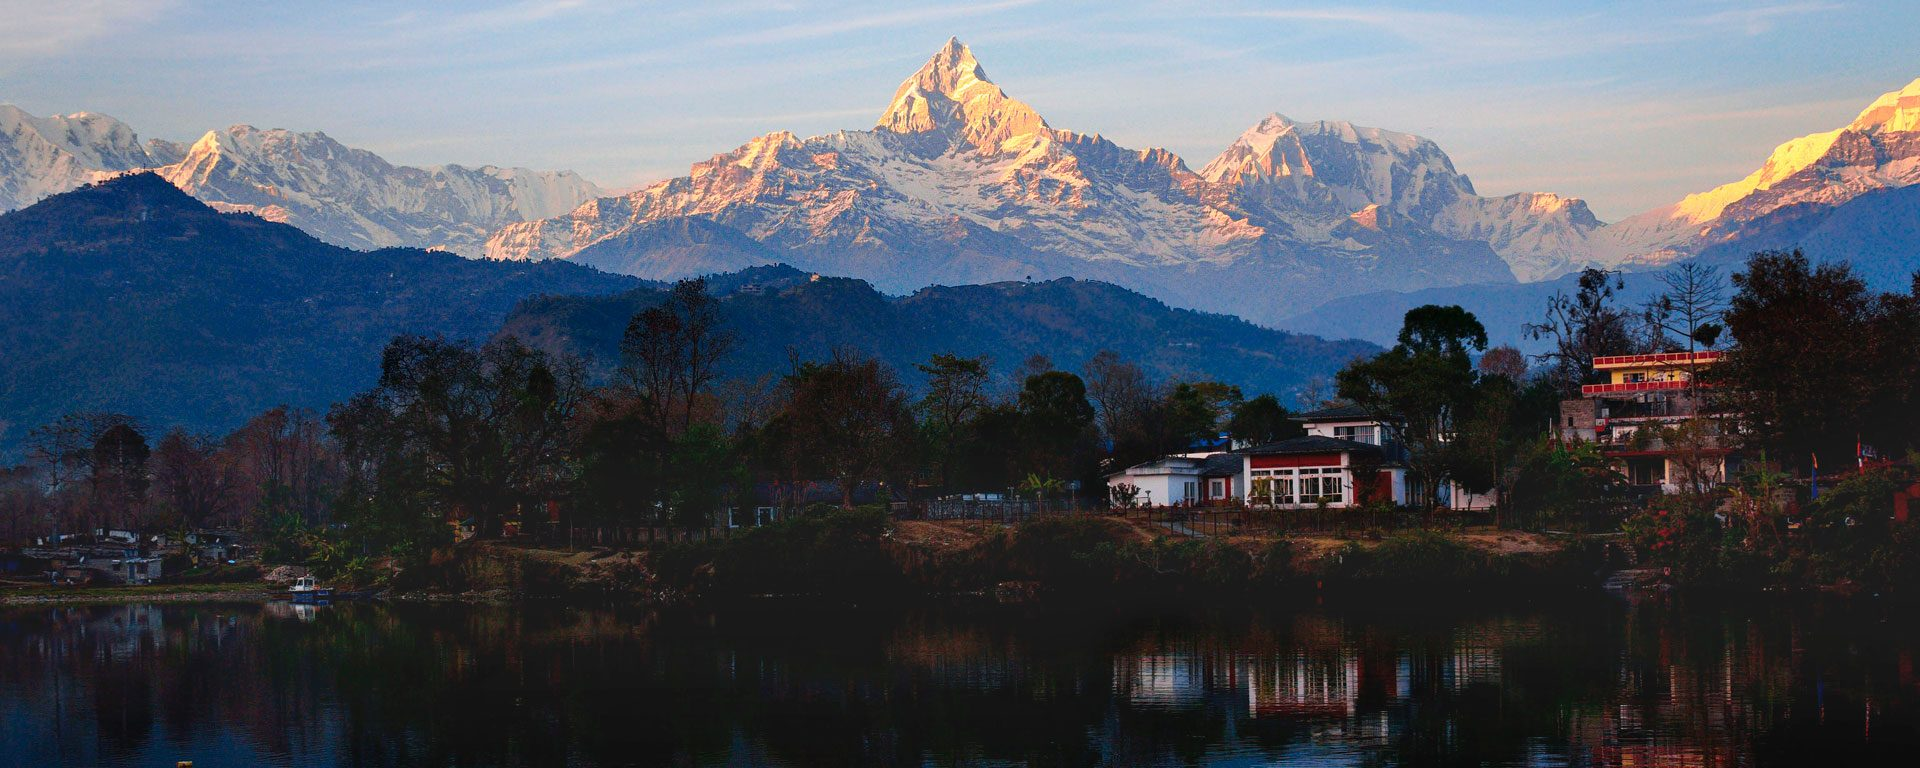 Reflections of the Annapurna Range in Phewa Lake at sunset, Pokhara, Nepal